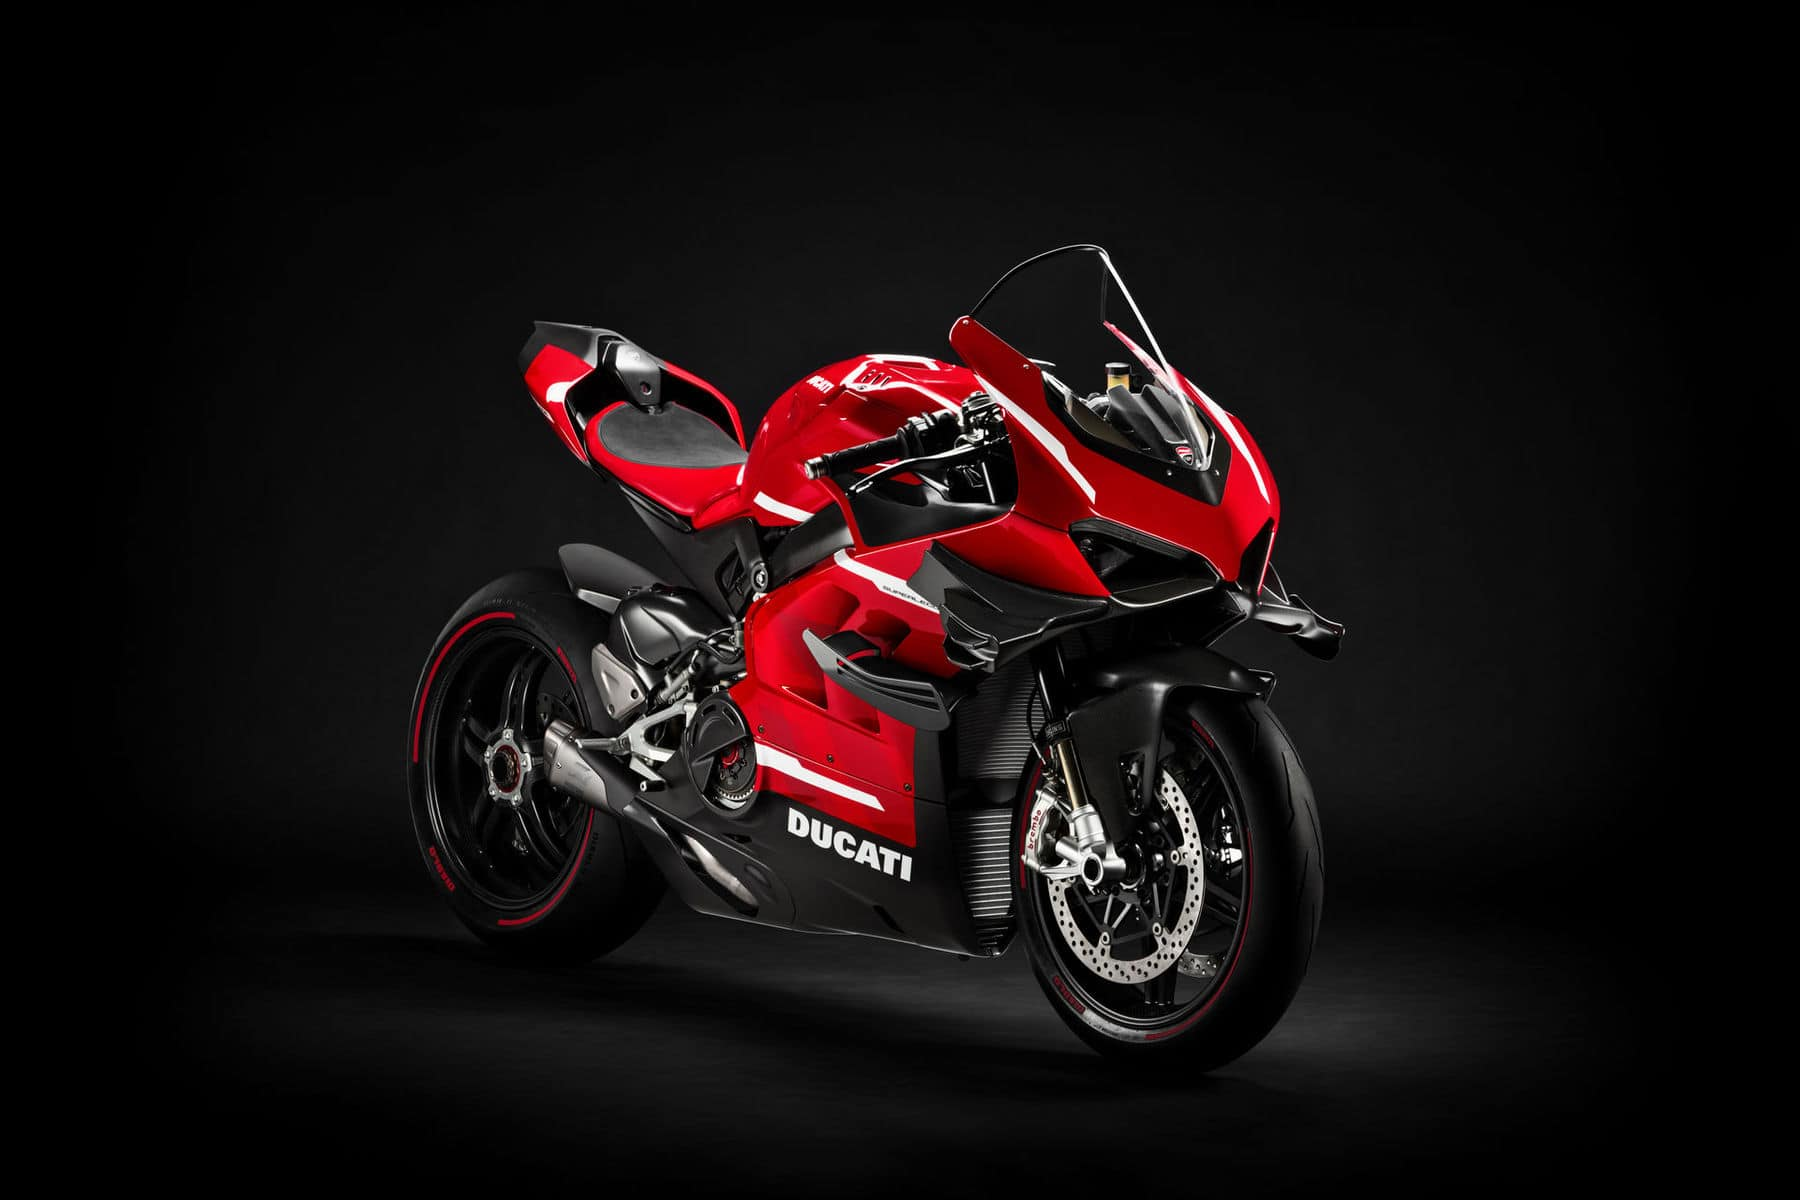 Ducati Superleggerra V4 1